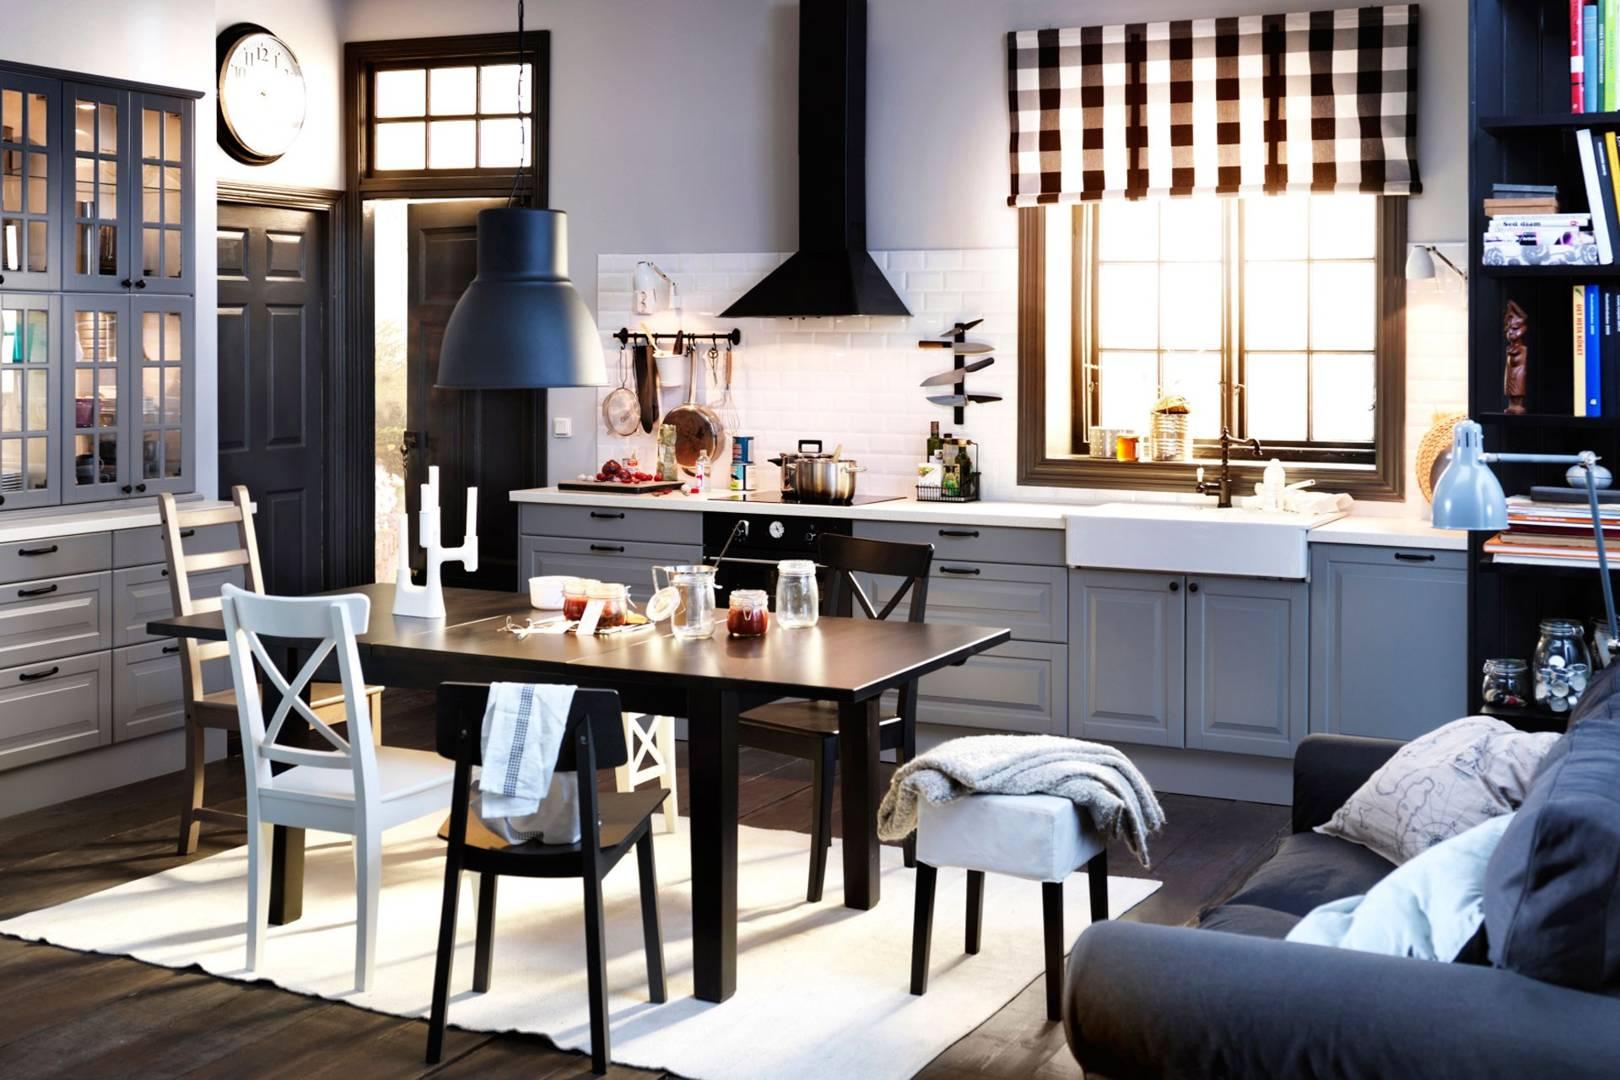 Small Ikea Kitchen Studio Small Spaces Ideas House Garden